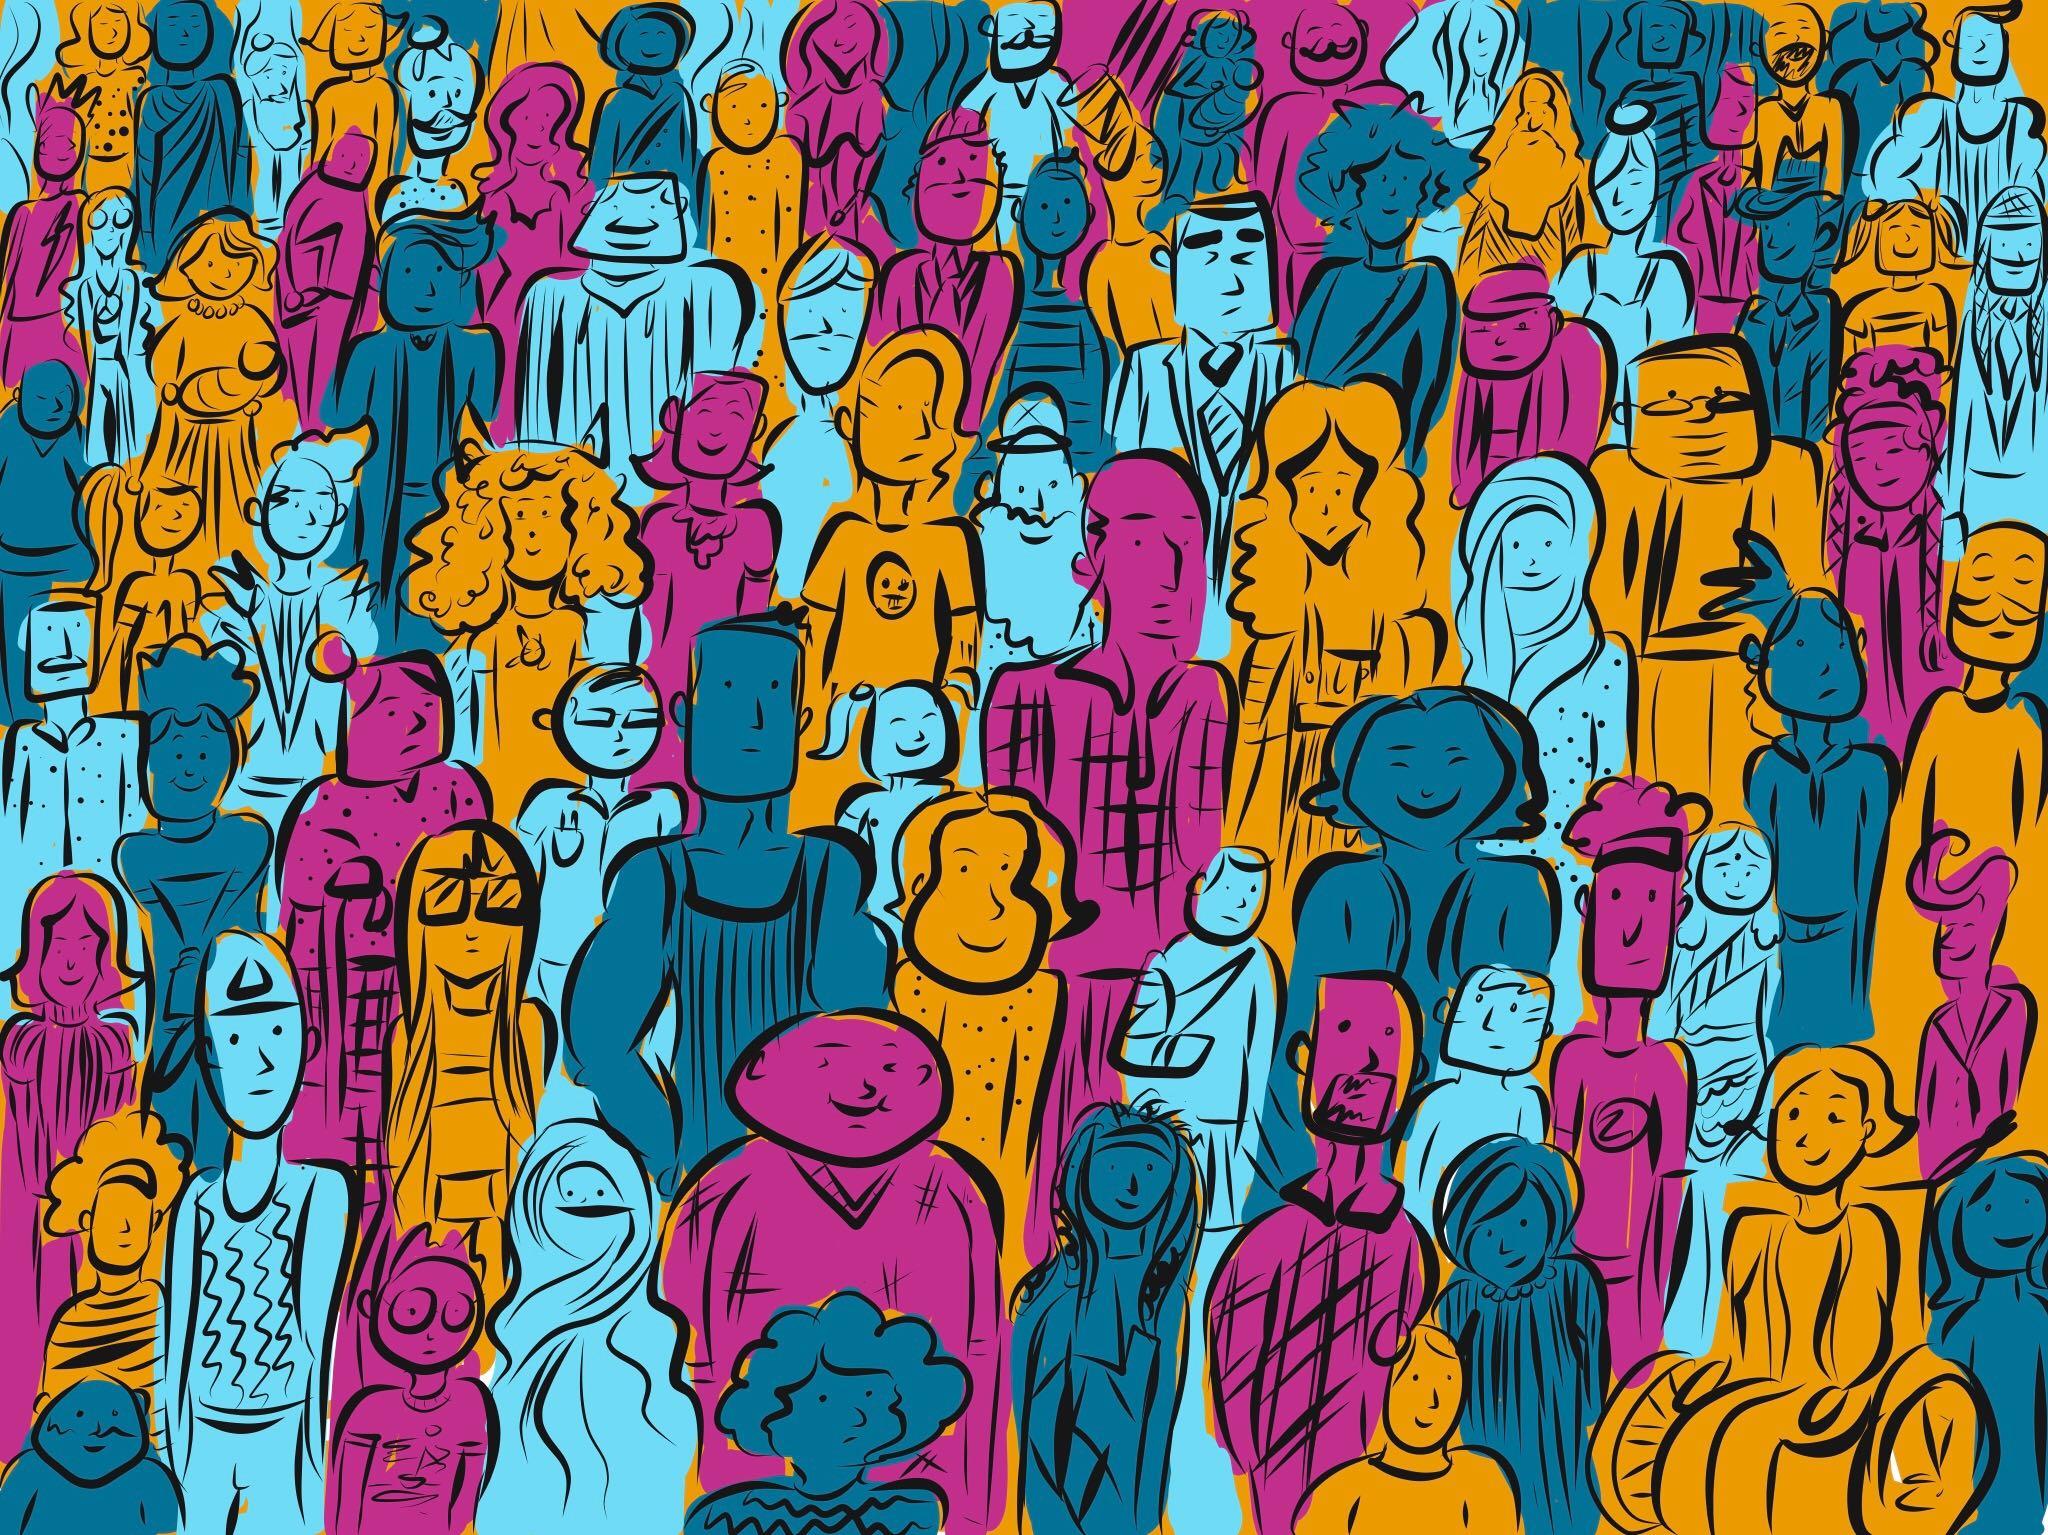 inclusivity crowd